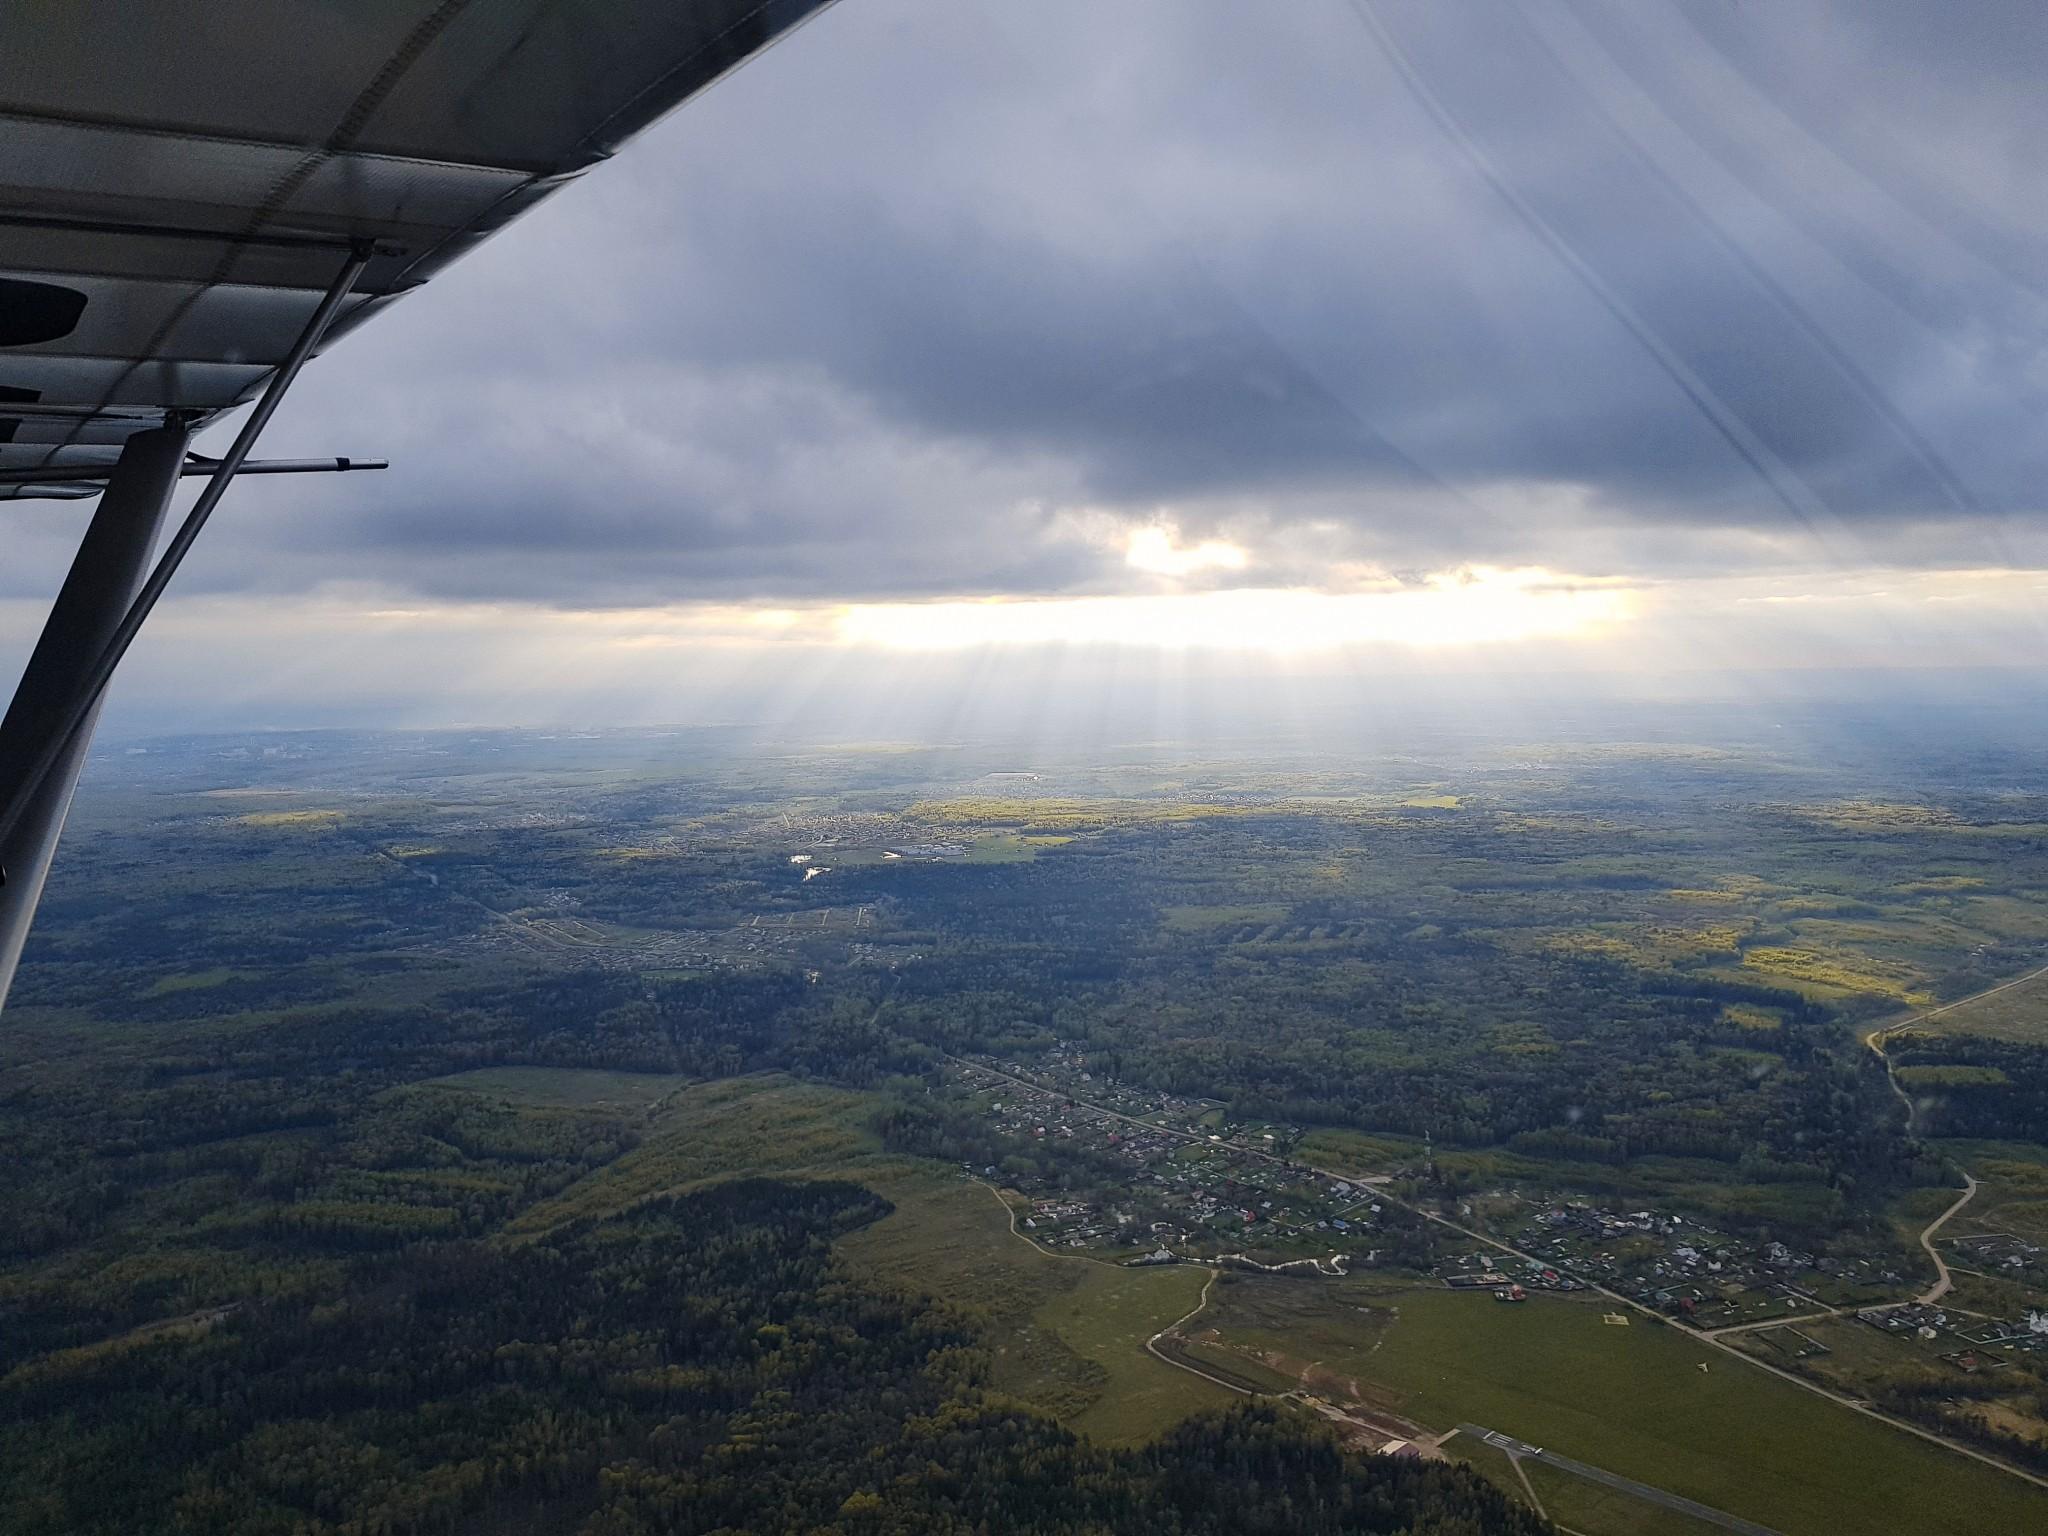 During our Flight Review at Novinki airport ~ Фото с нашей лётной проверки в Новинках